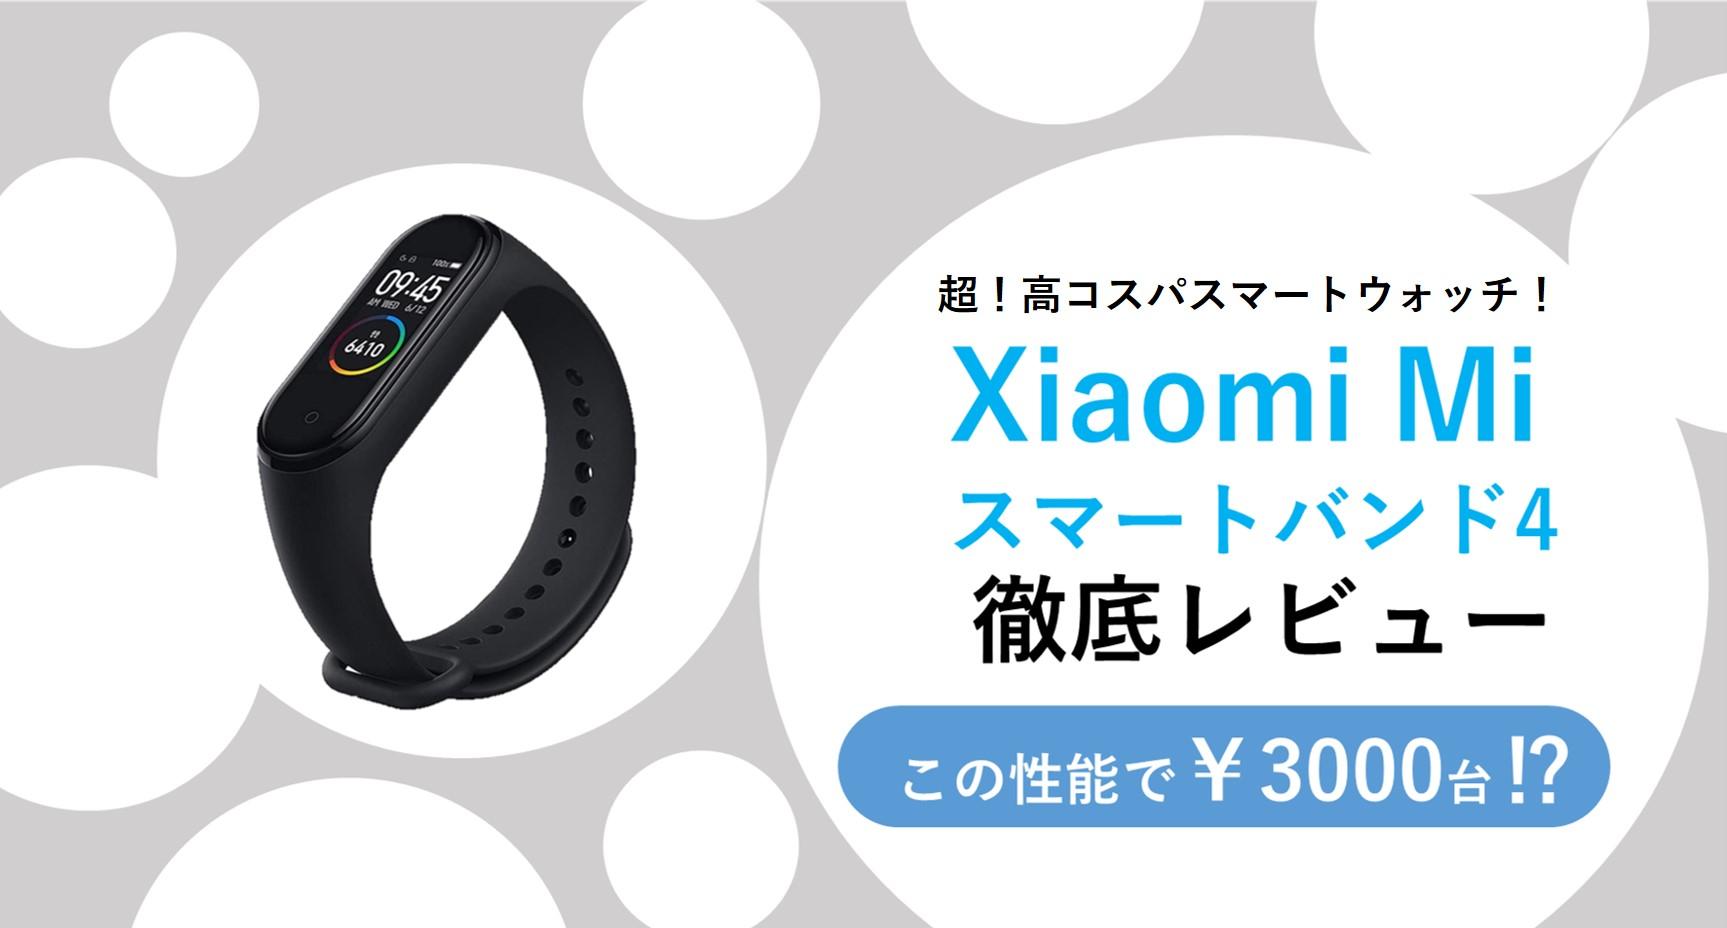 Xiaomi Mi スマートバンド4 レビュー アイキャッチ